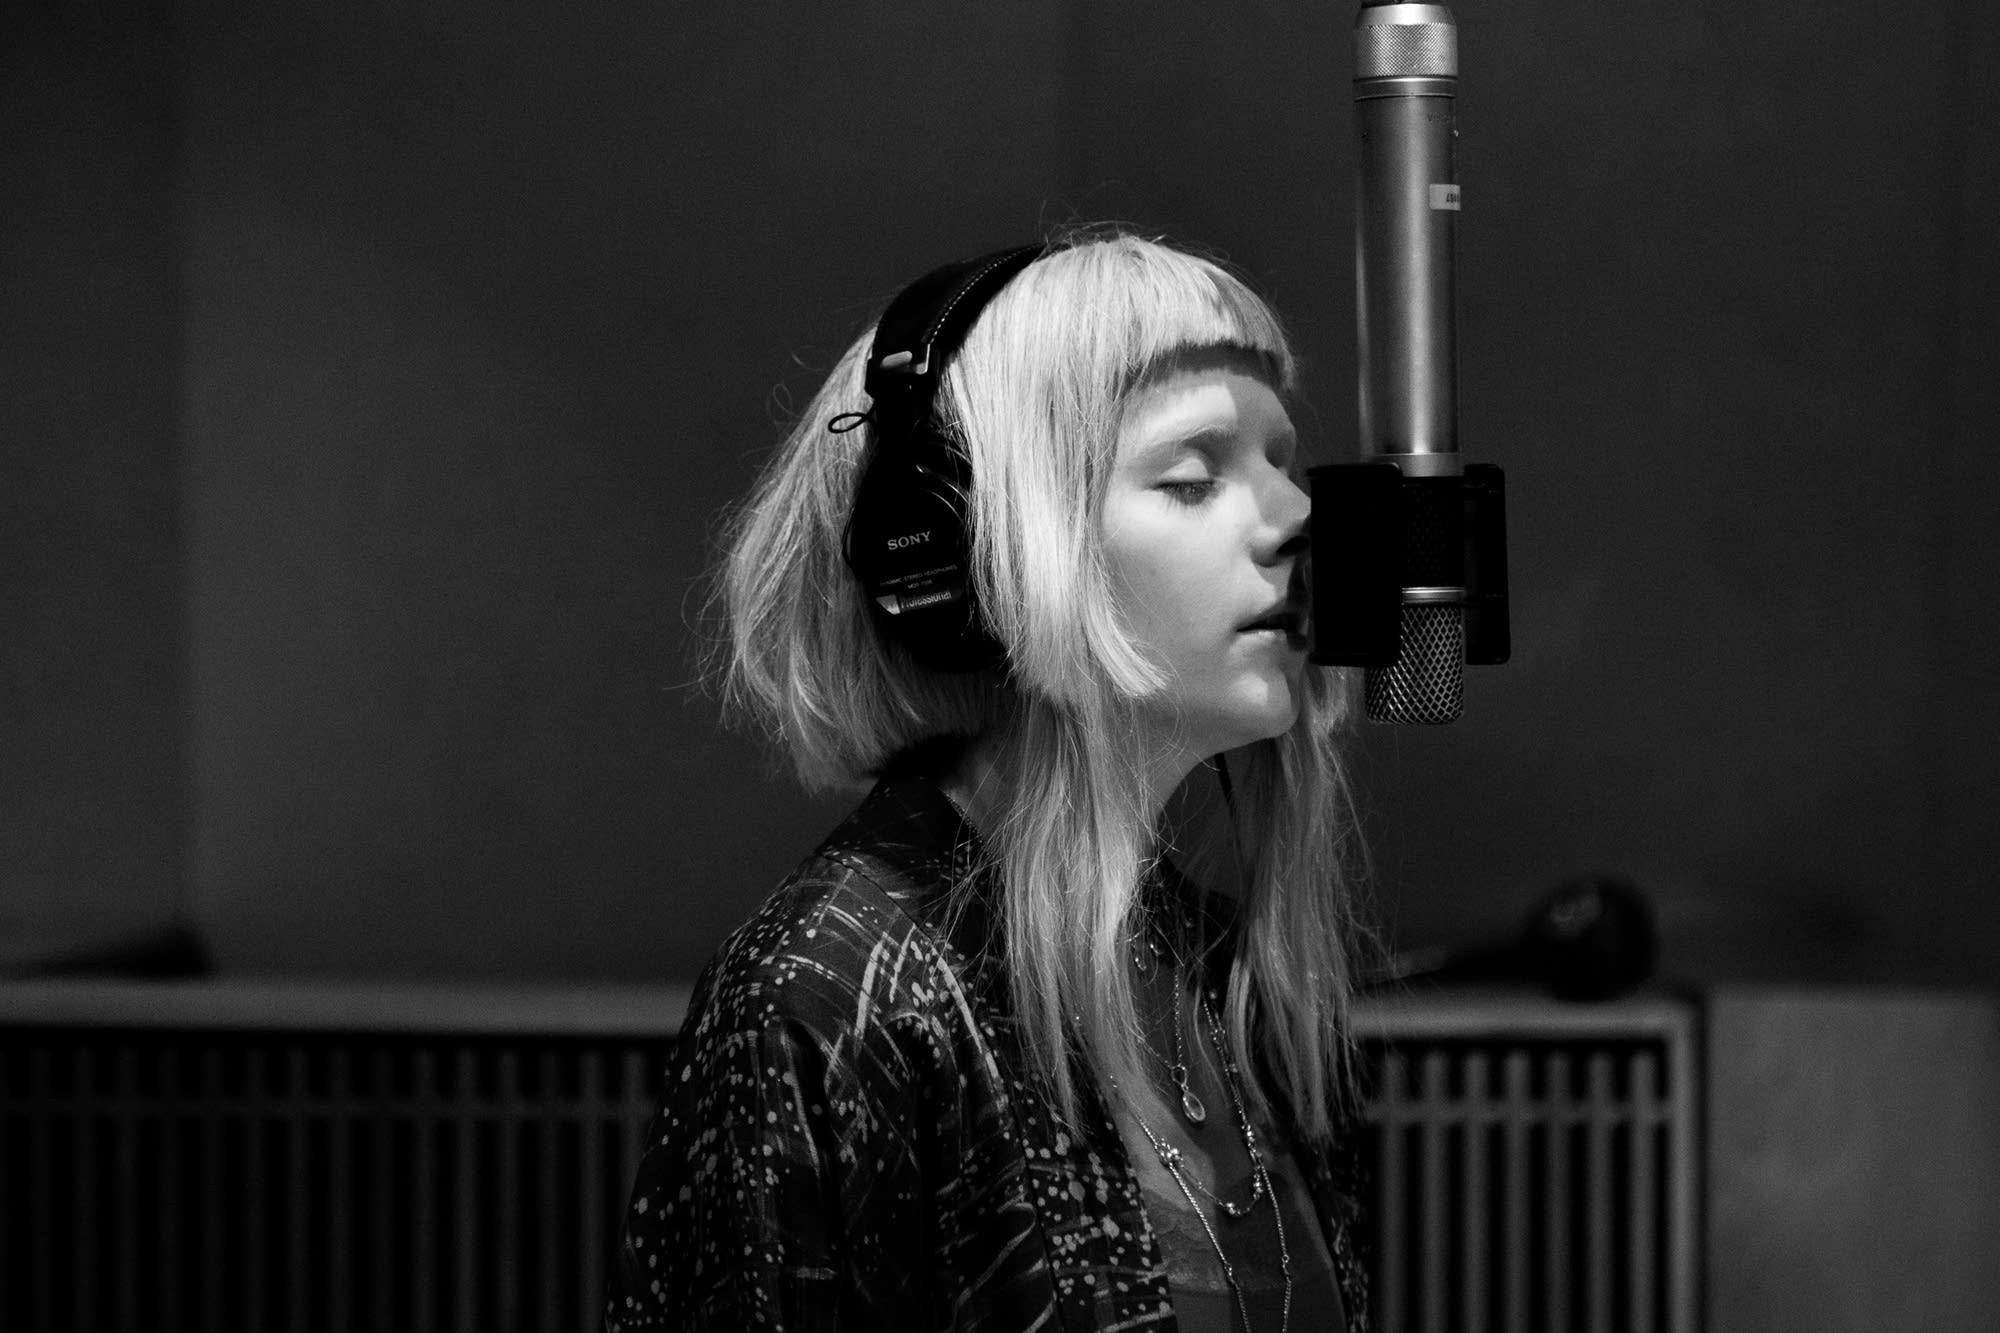 Aurora performs in The Current studio